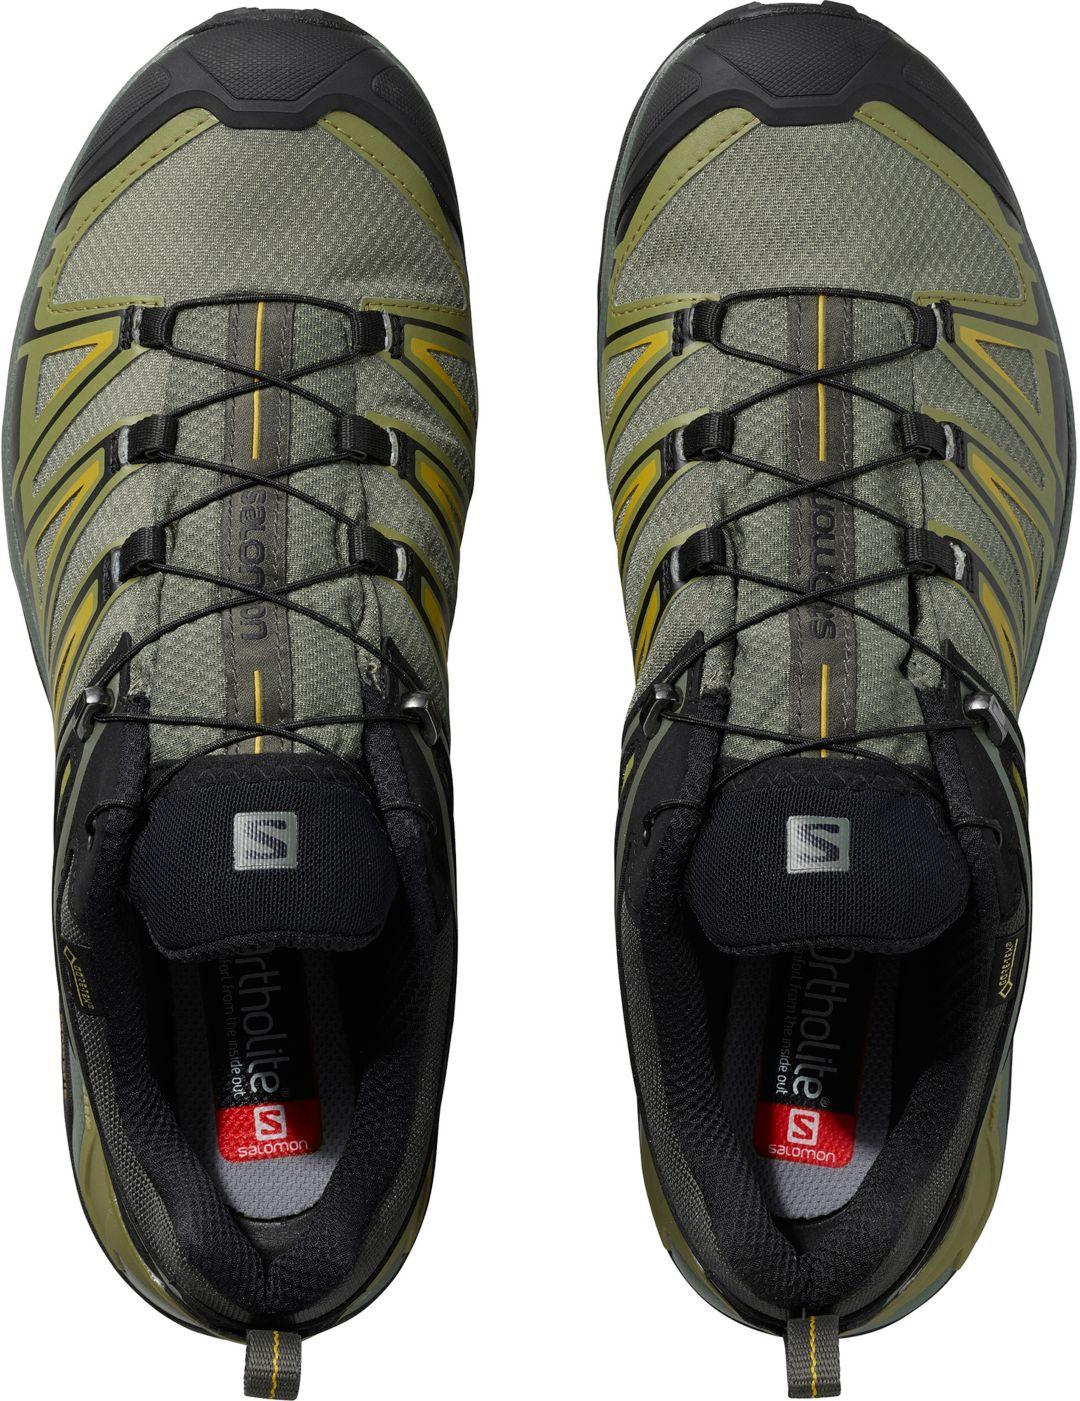 c6051a6df5a Salomon Men's X Ultra 3 GTX Waterproof Hiking Shoes